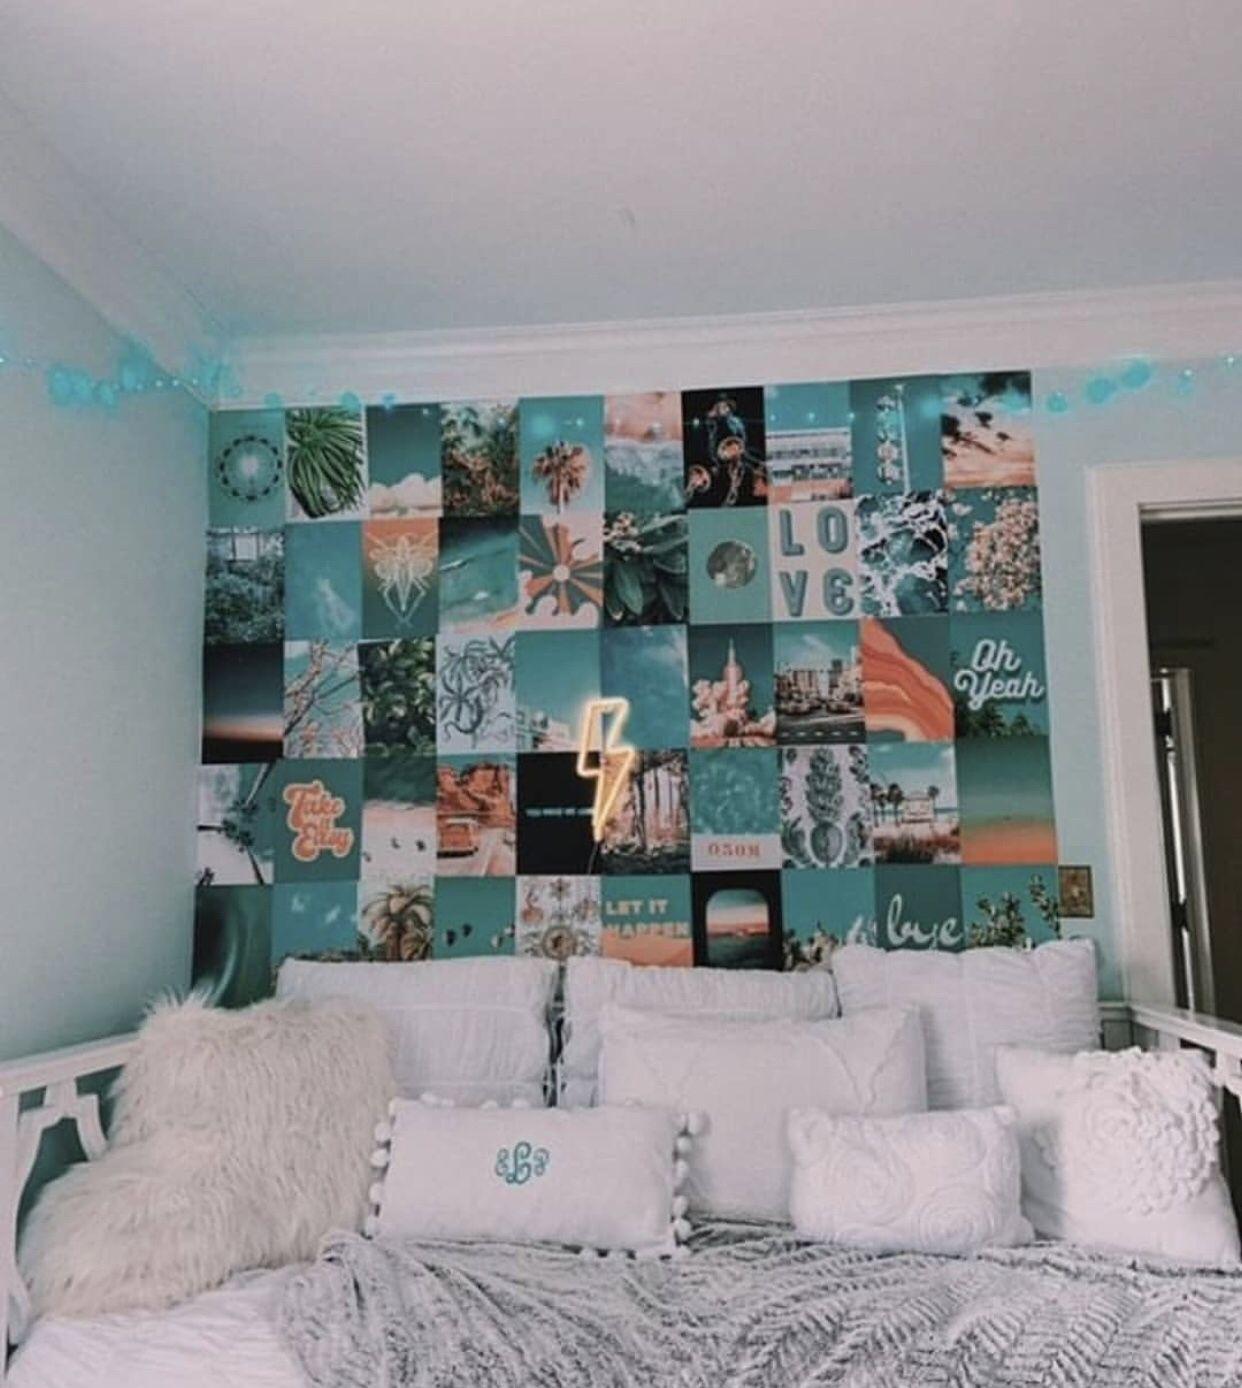 Aesthetic Photograph Wall Aesthetic Photograph Wall Photo Walls Bedroom Room Inspiration Bedroom Girl Bedroom Decor